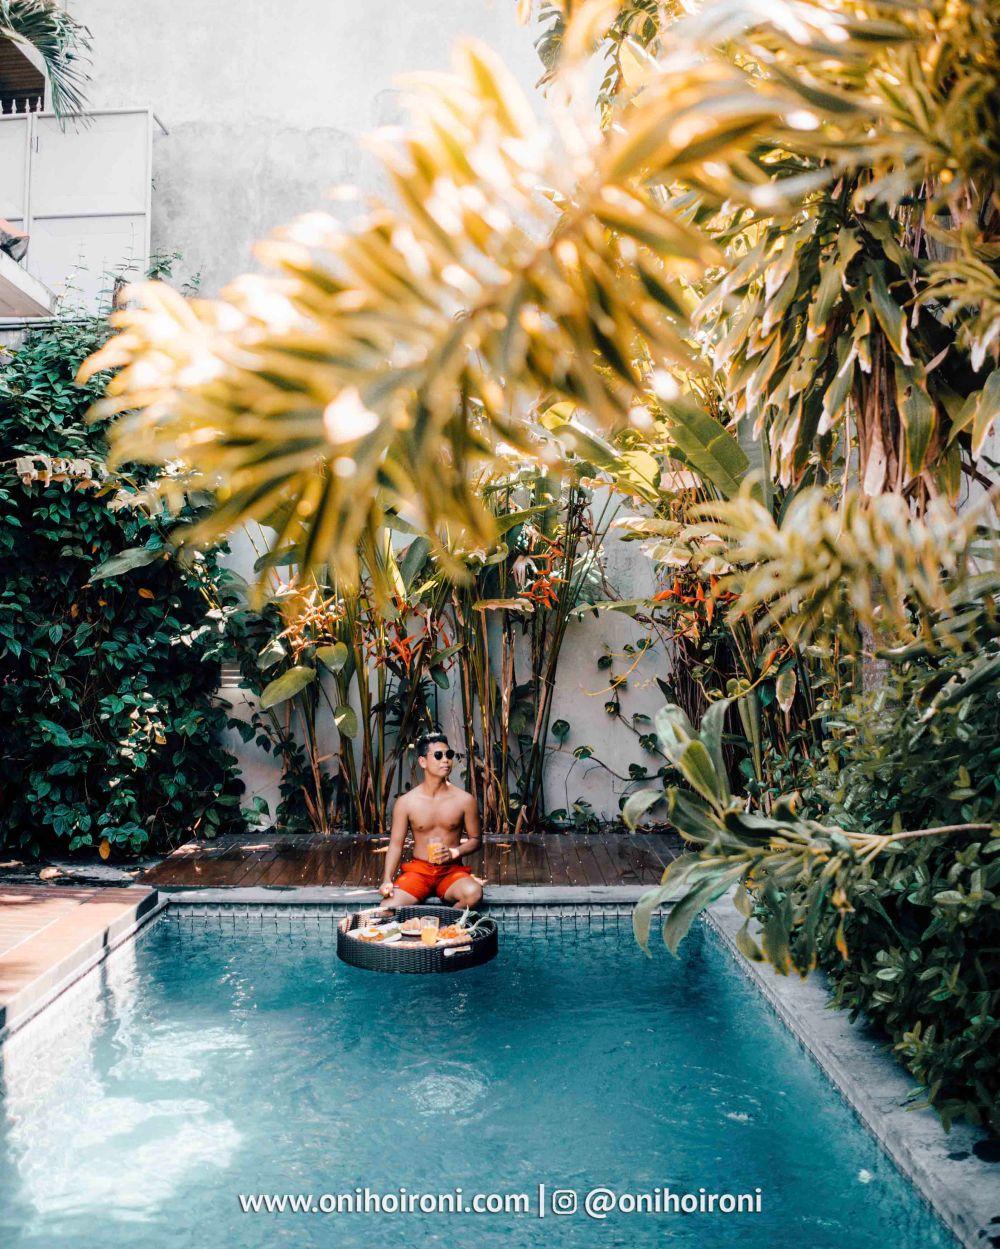 8 rekomendasi villa yang terdekat dengan la favela chalet by sabda oni hoironi